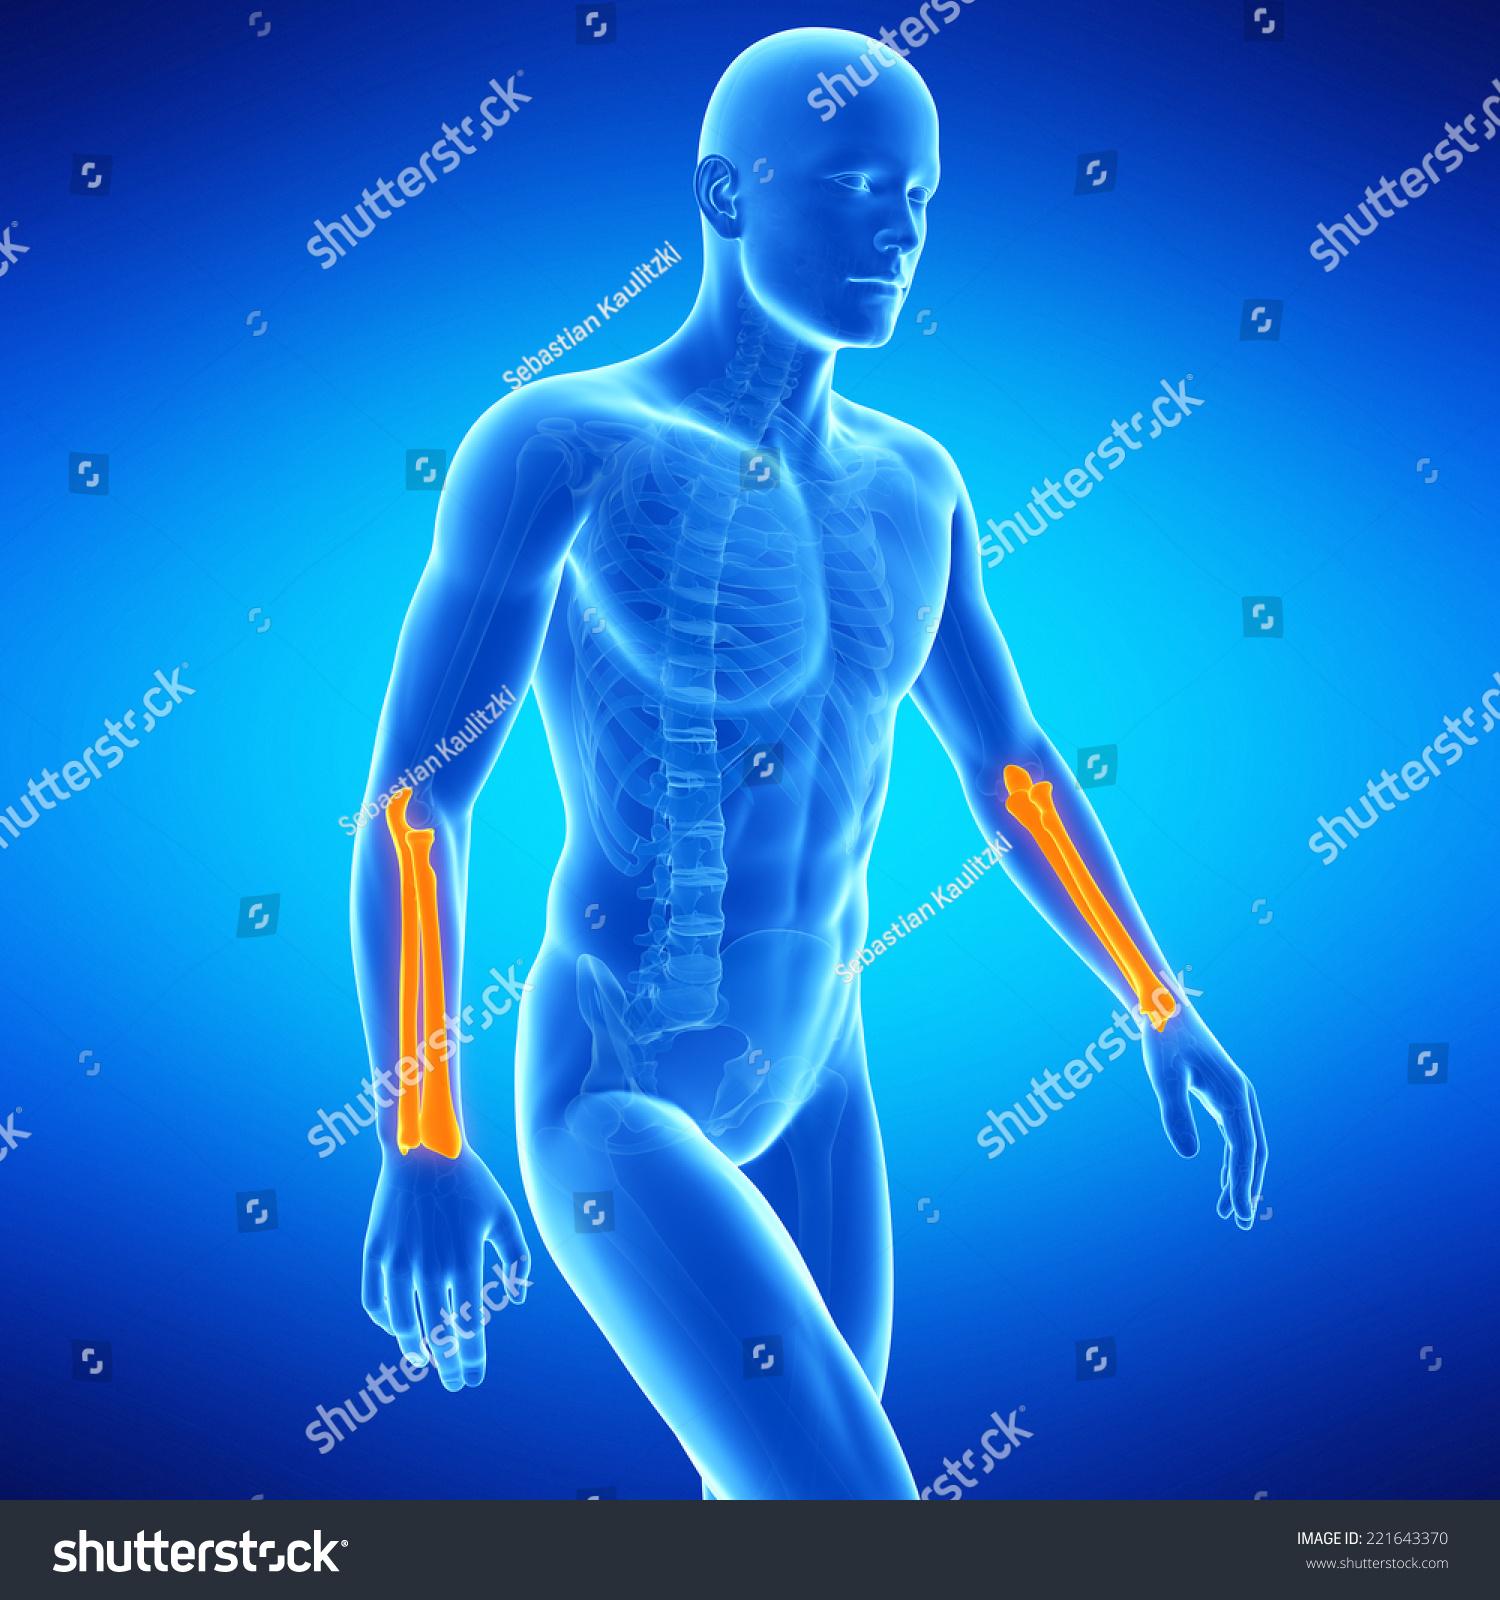 Medical Illustration Lower Arm Bones Stock Illustration 221643370